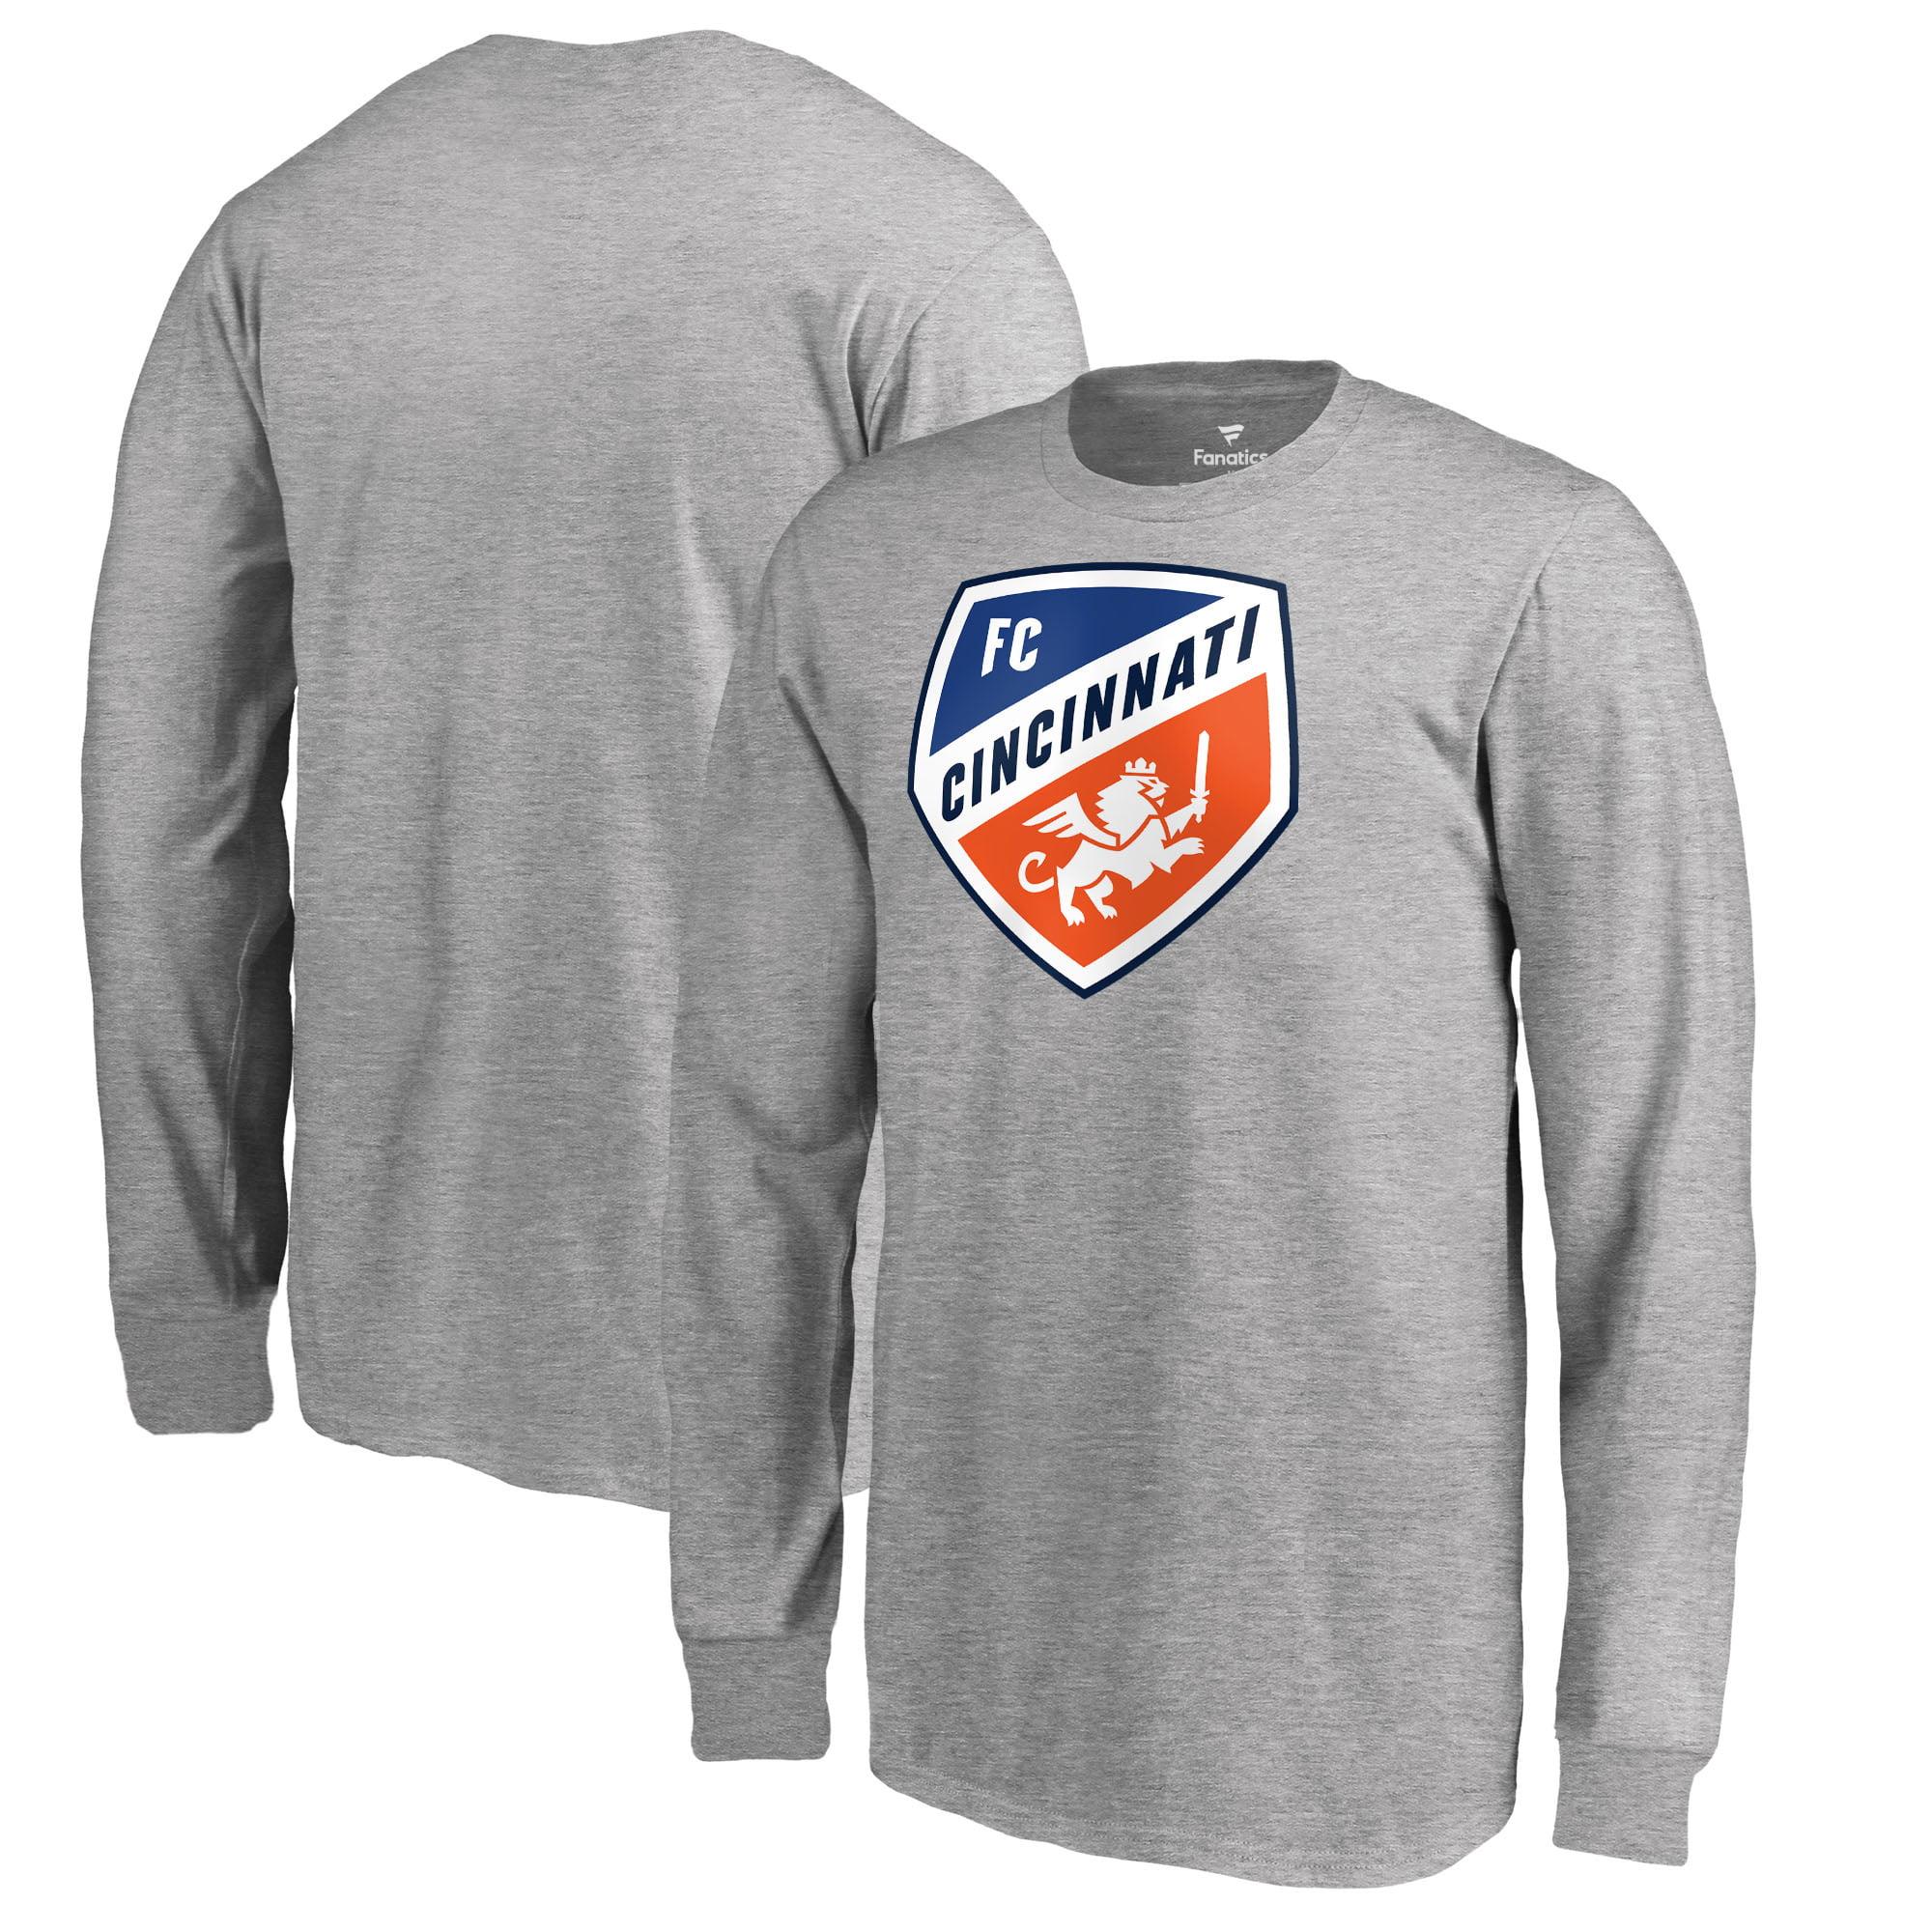 FC Cincinnati Fanatics Branded Youth Primary Logo Long Sleeve T-Shirt - Heather Gray